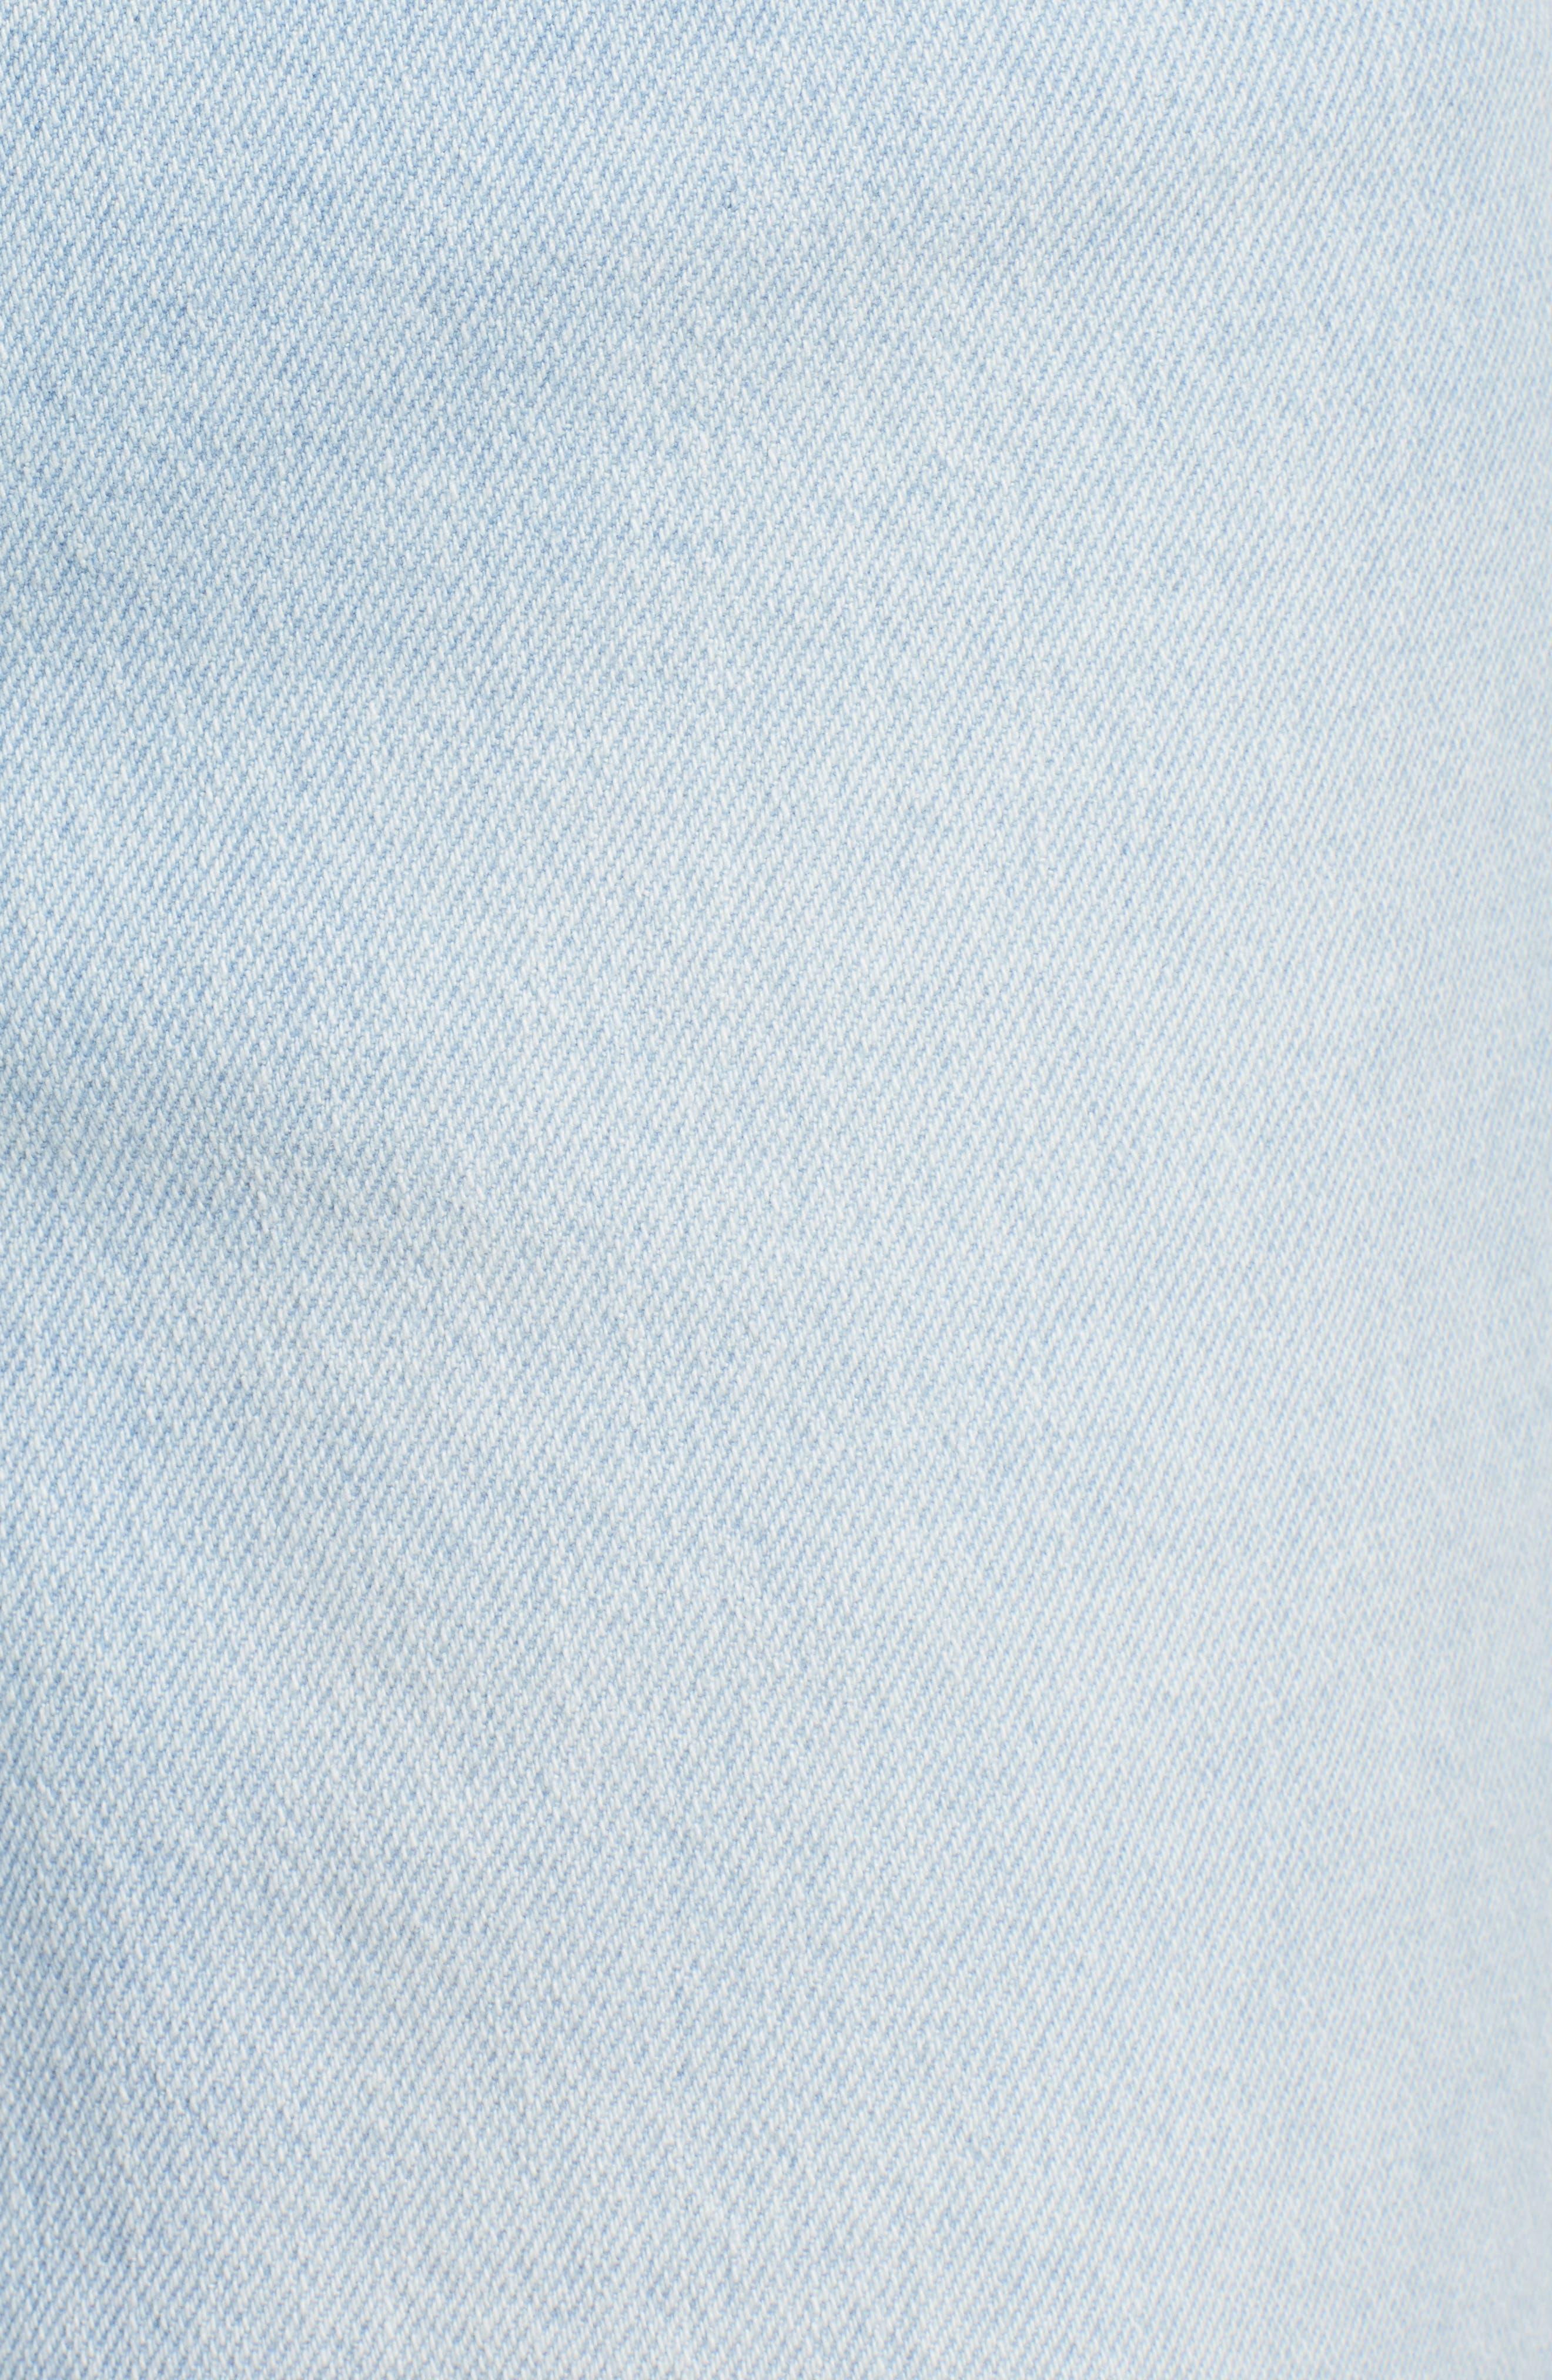 PROSPERITY DENIM, Fray Hem Wide Leg Crop Jeans, Alternate thumbnail 6, color, LIGHT WASH